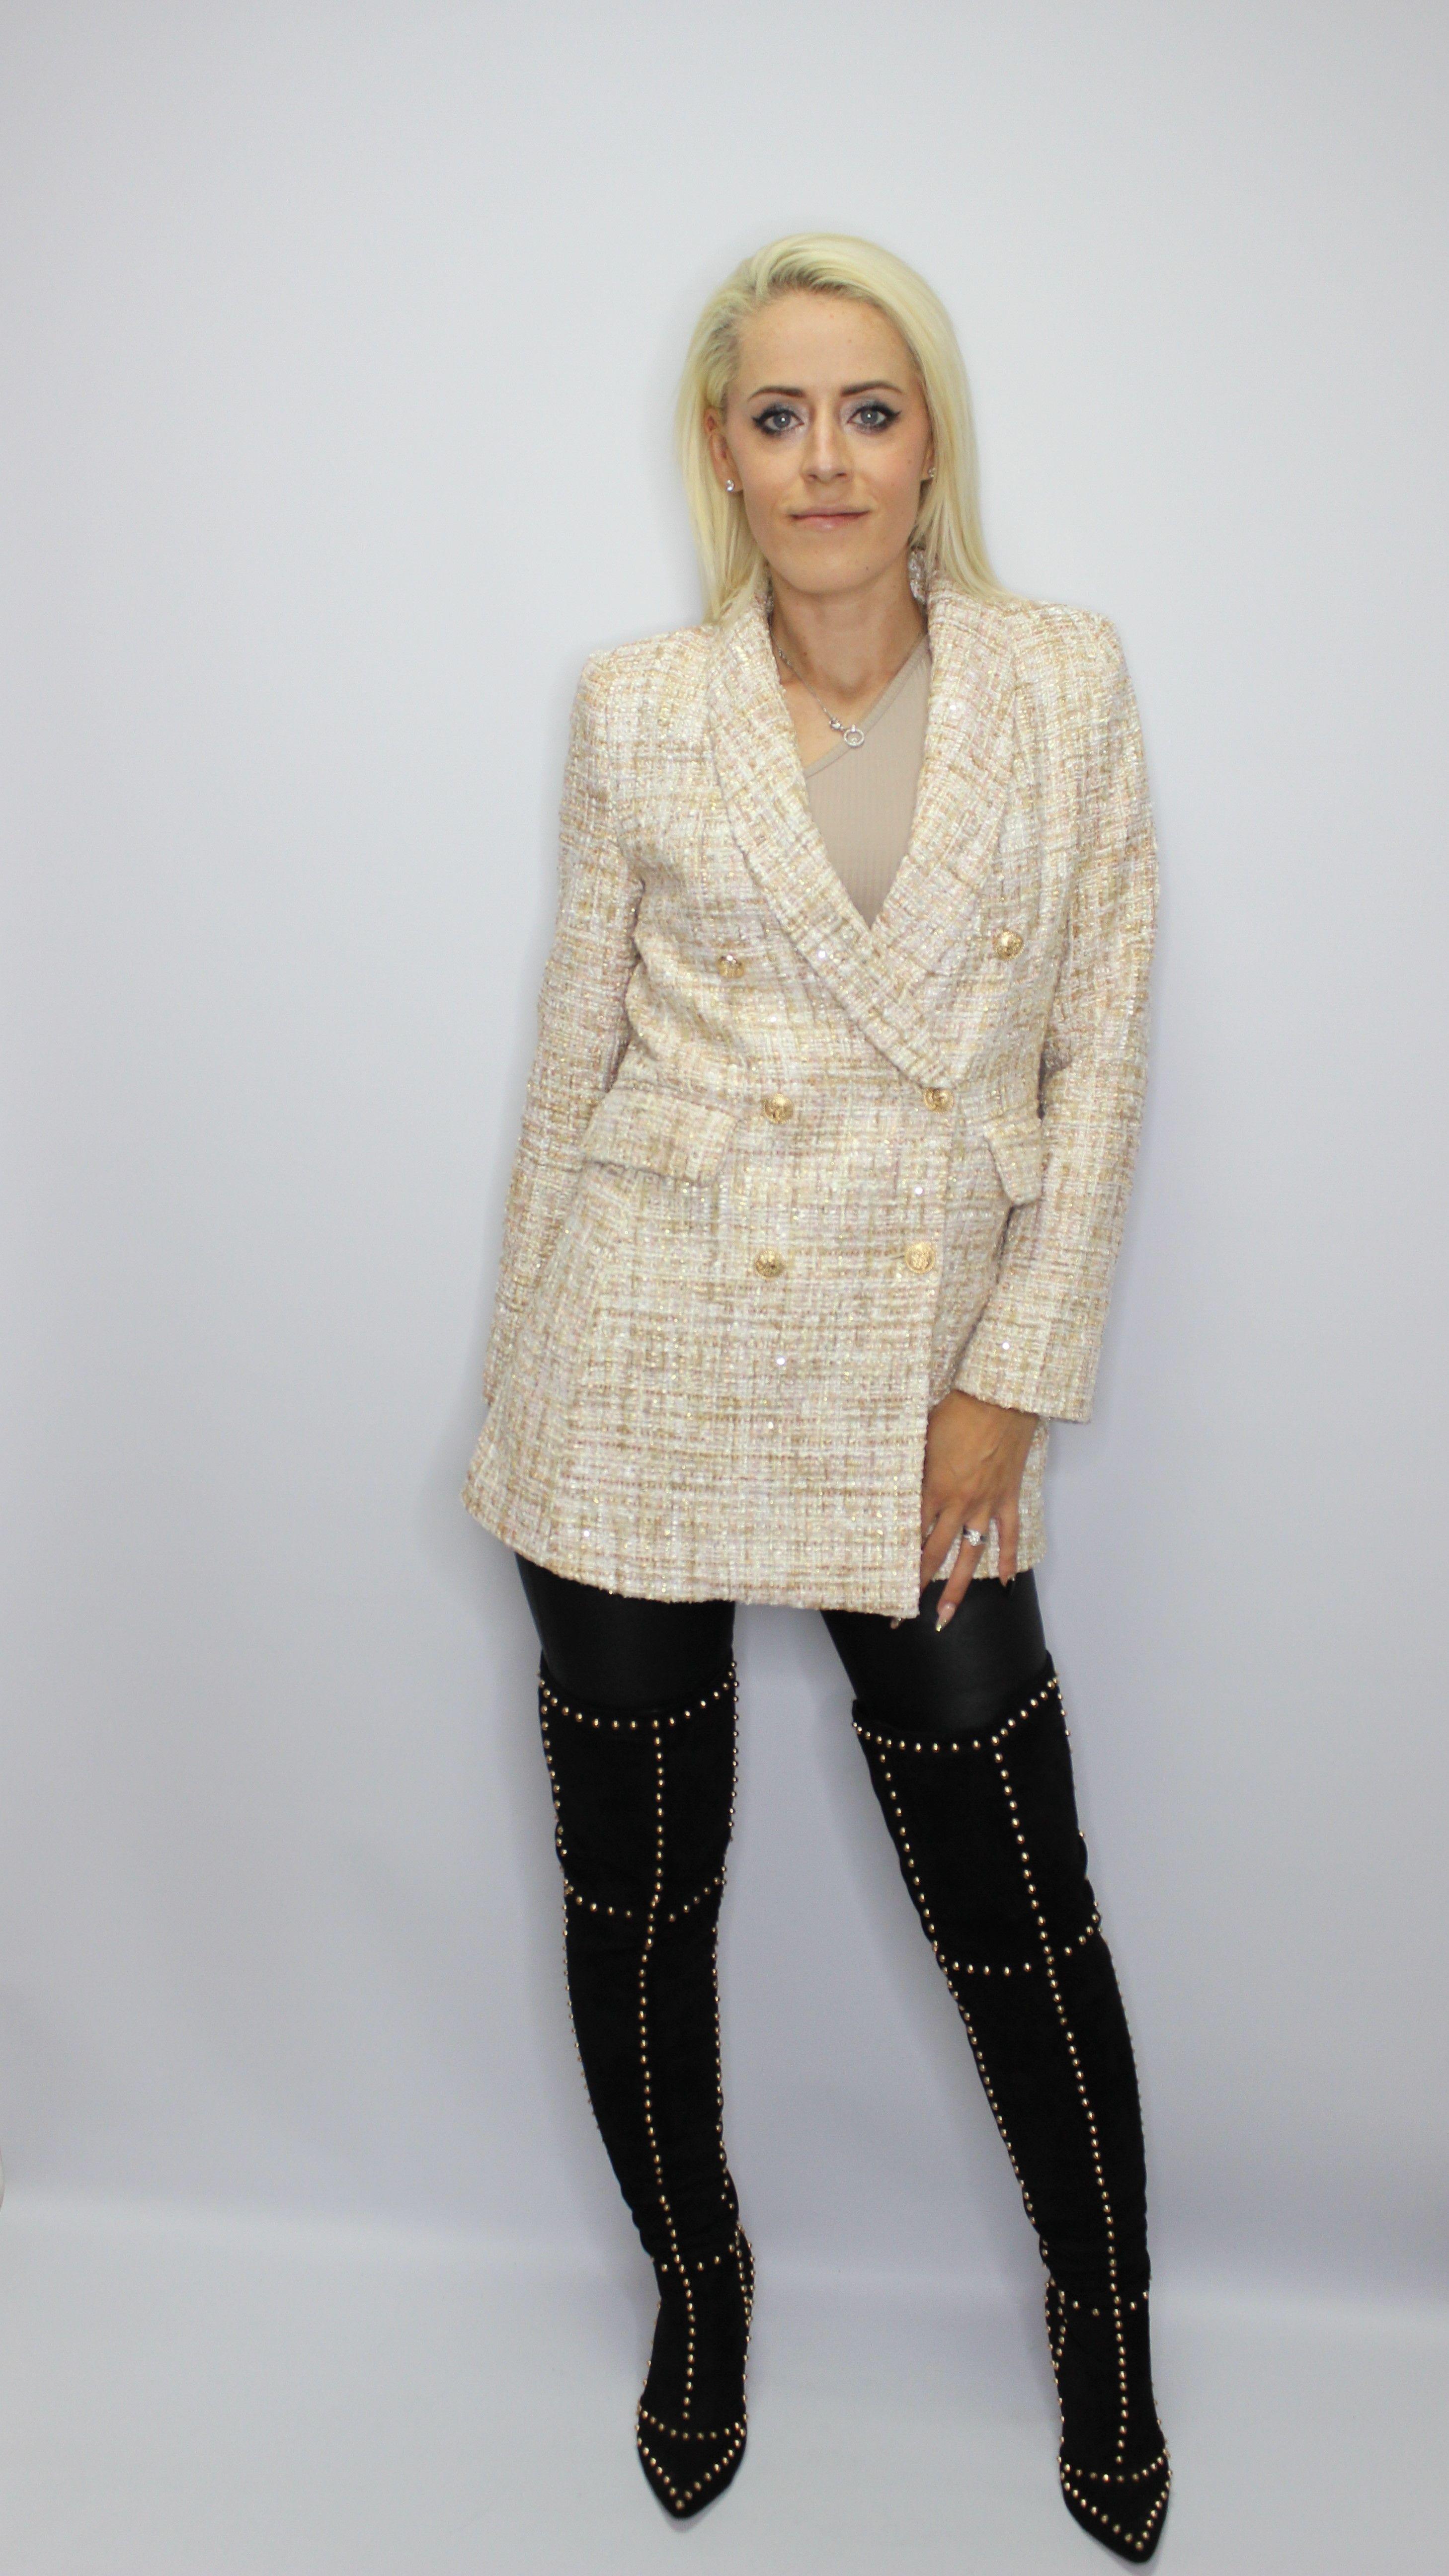 Chanel Style Blazer